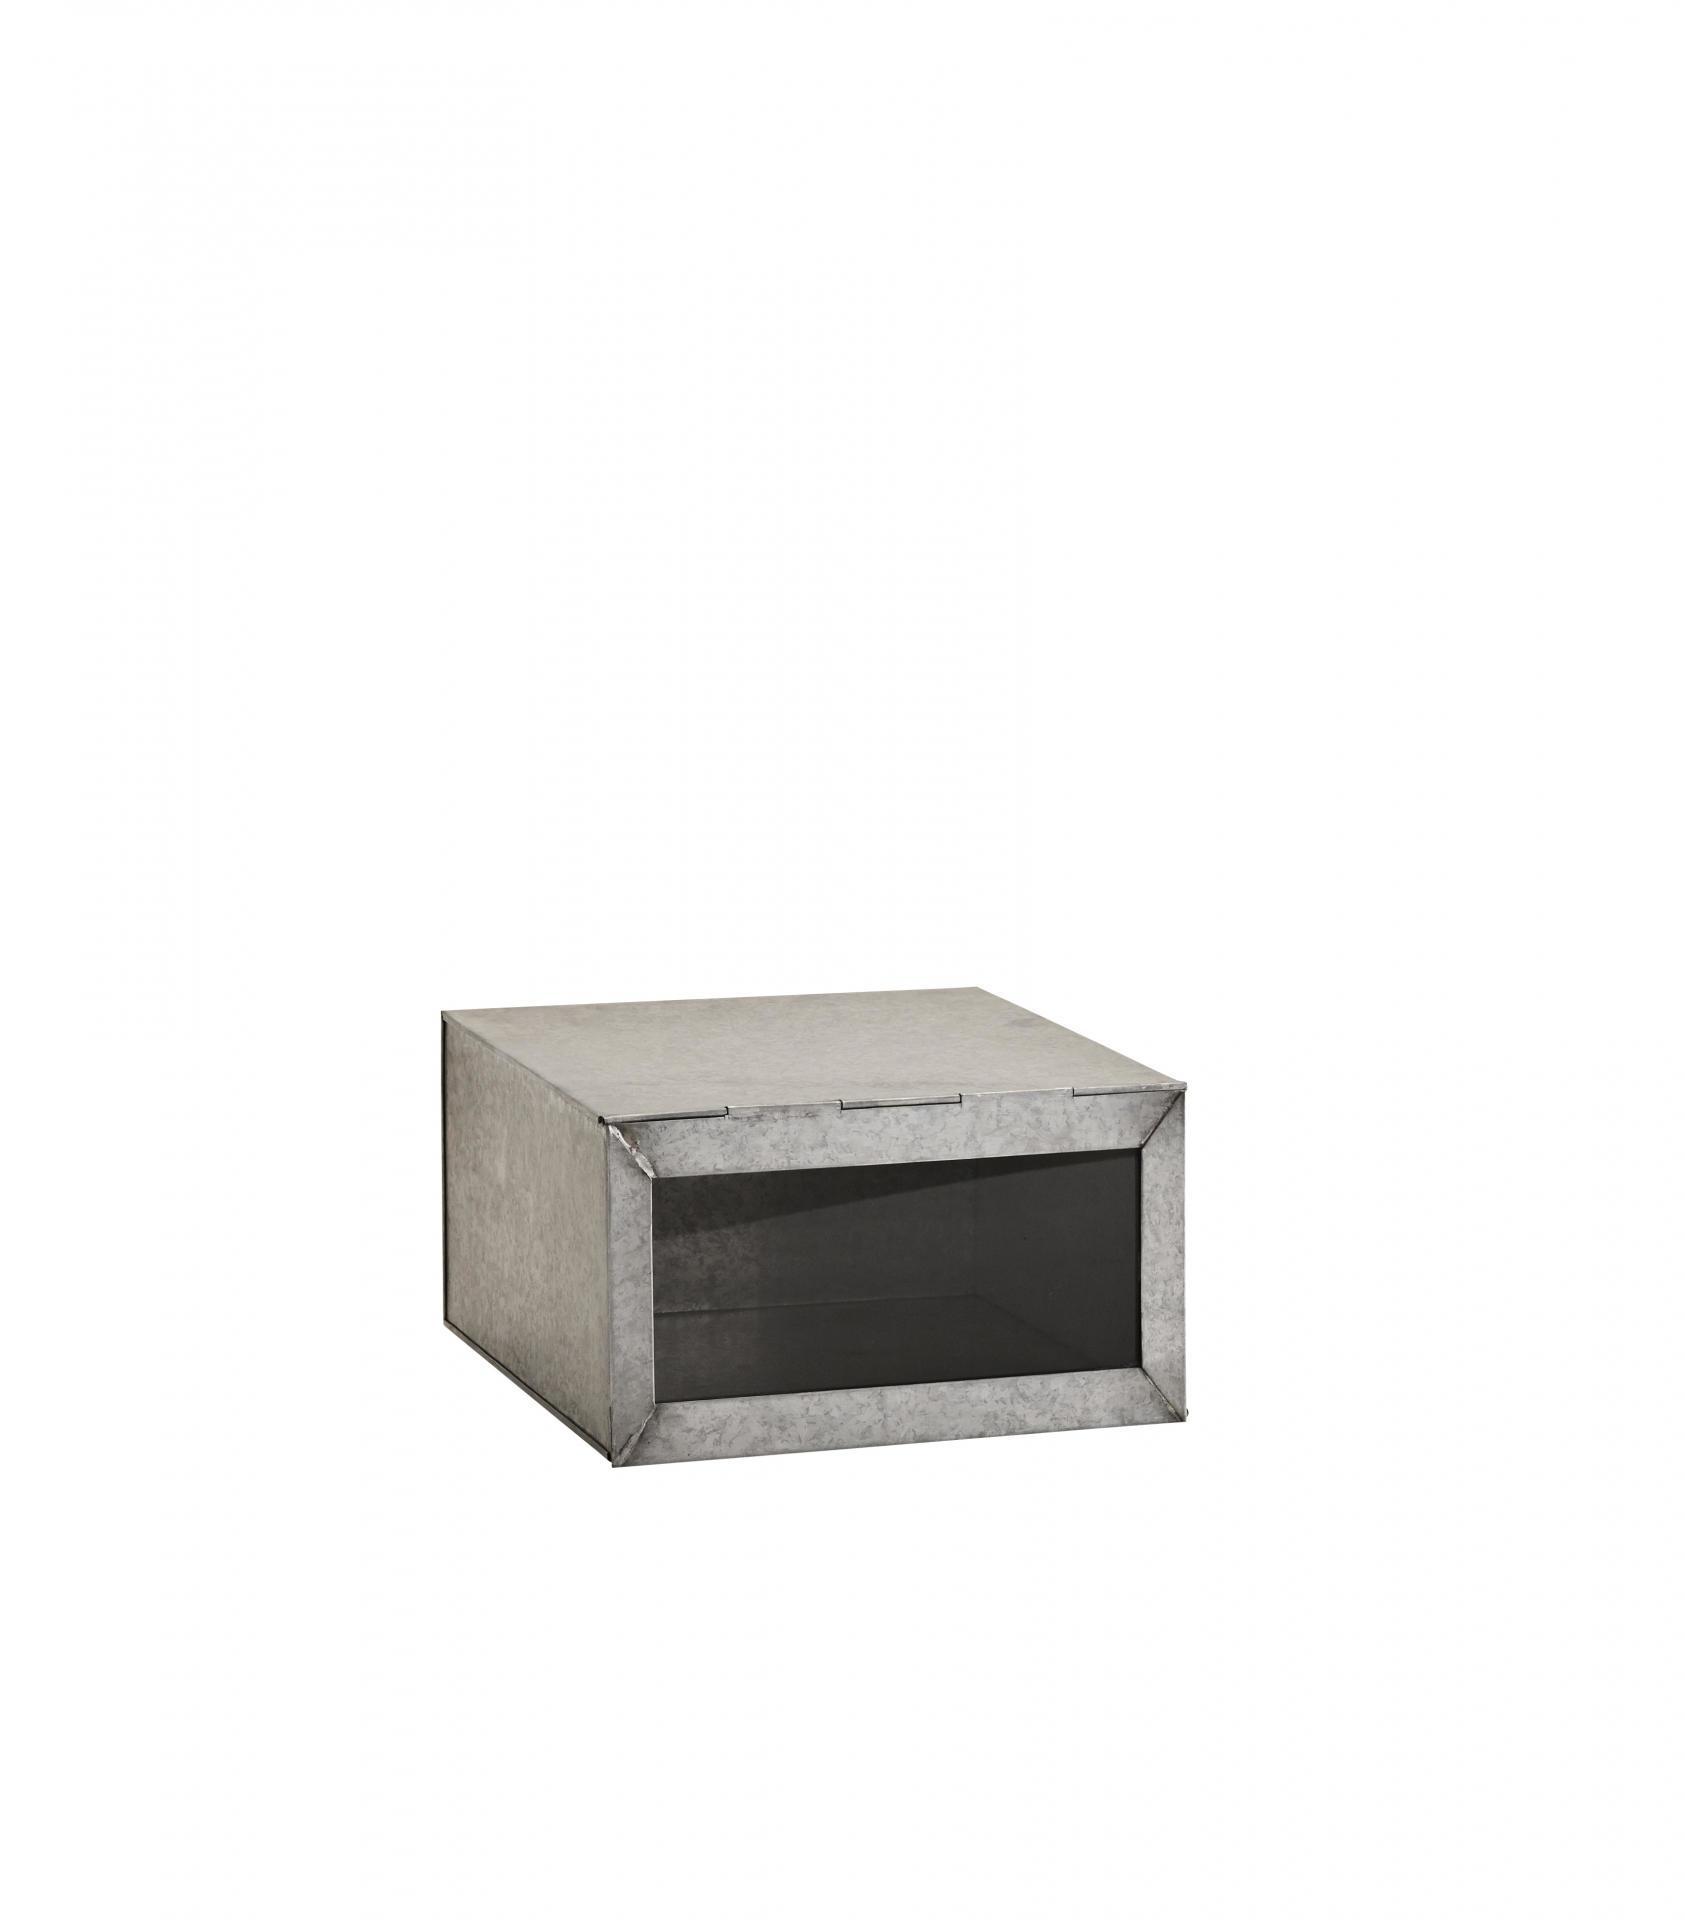 MADAM STOLTZ Zinkový box Glass lid, šedá barva, zinek